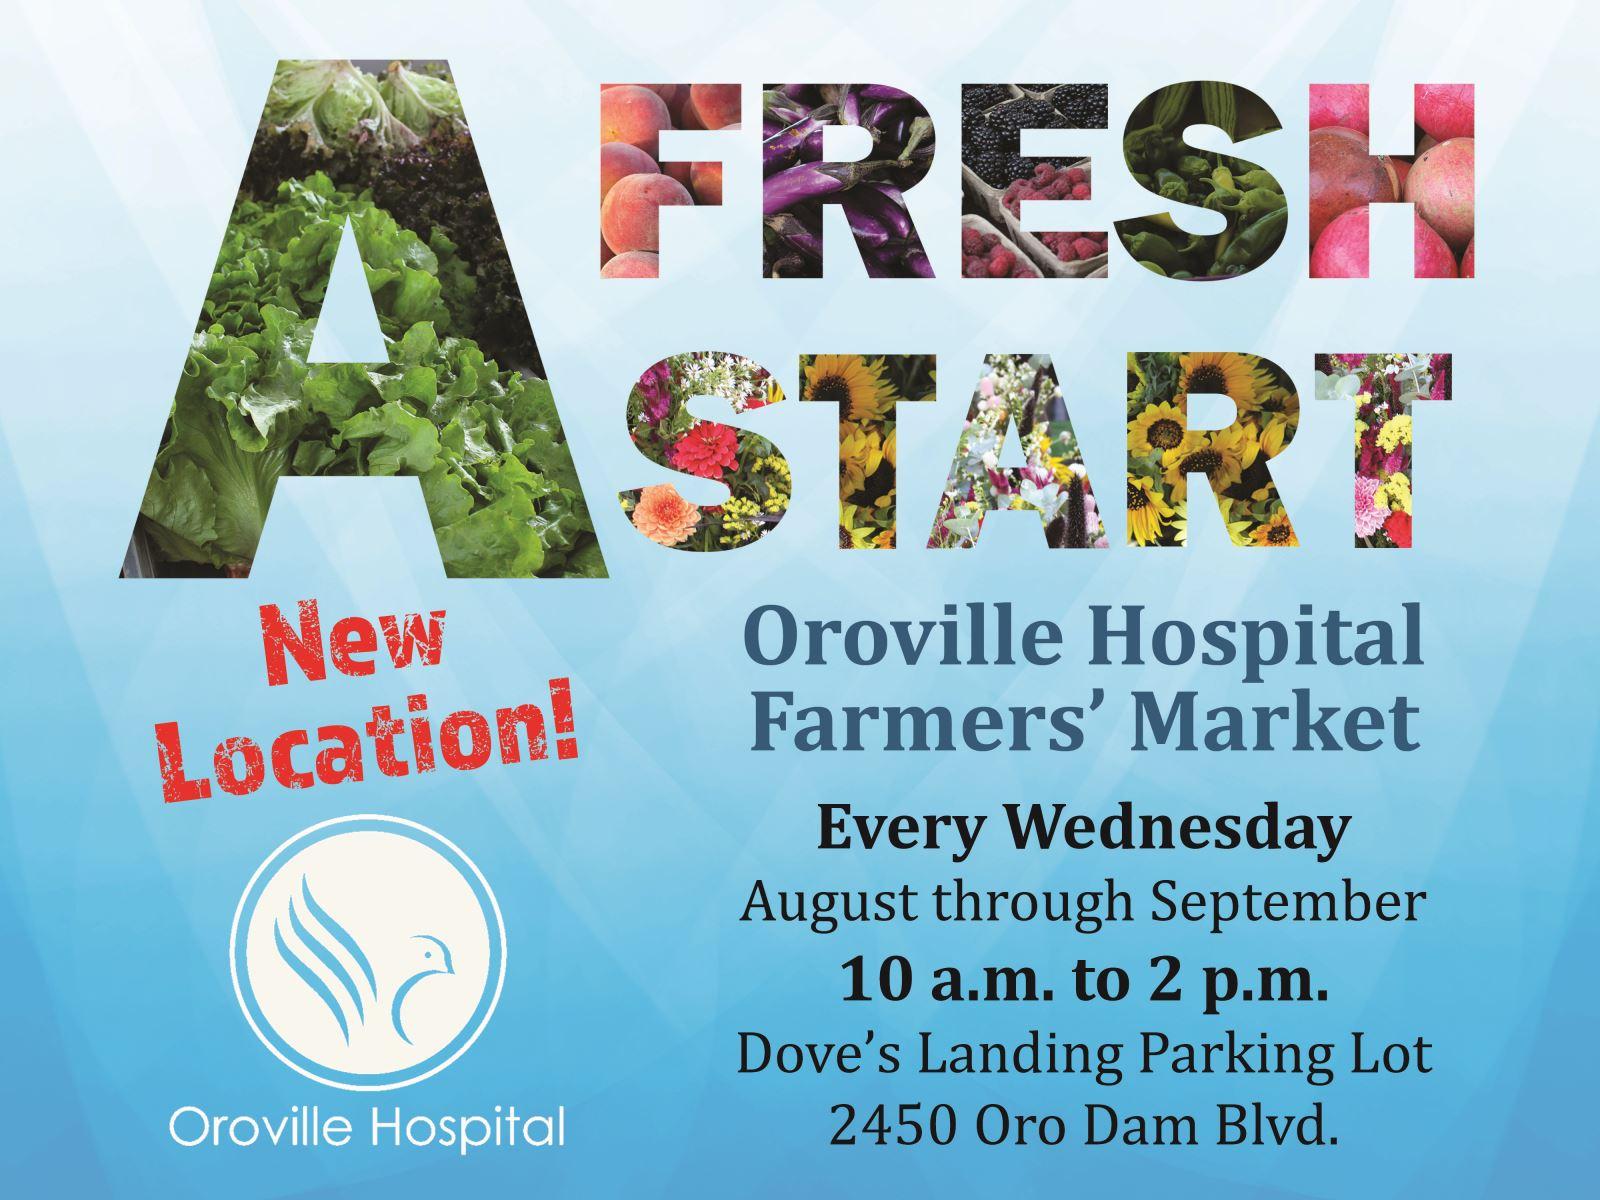 oroville hospital u0026 39 s farmers u0026 39  market moves to new location